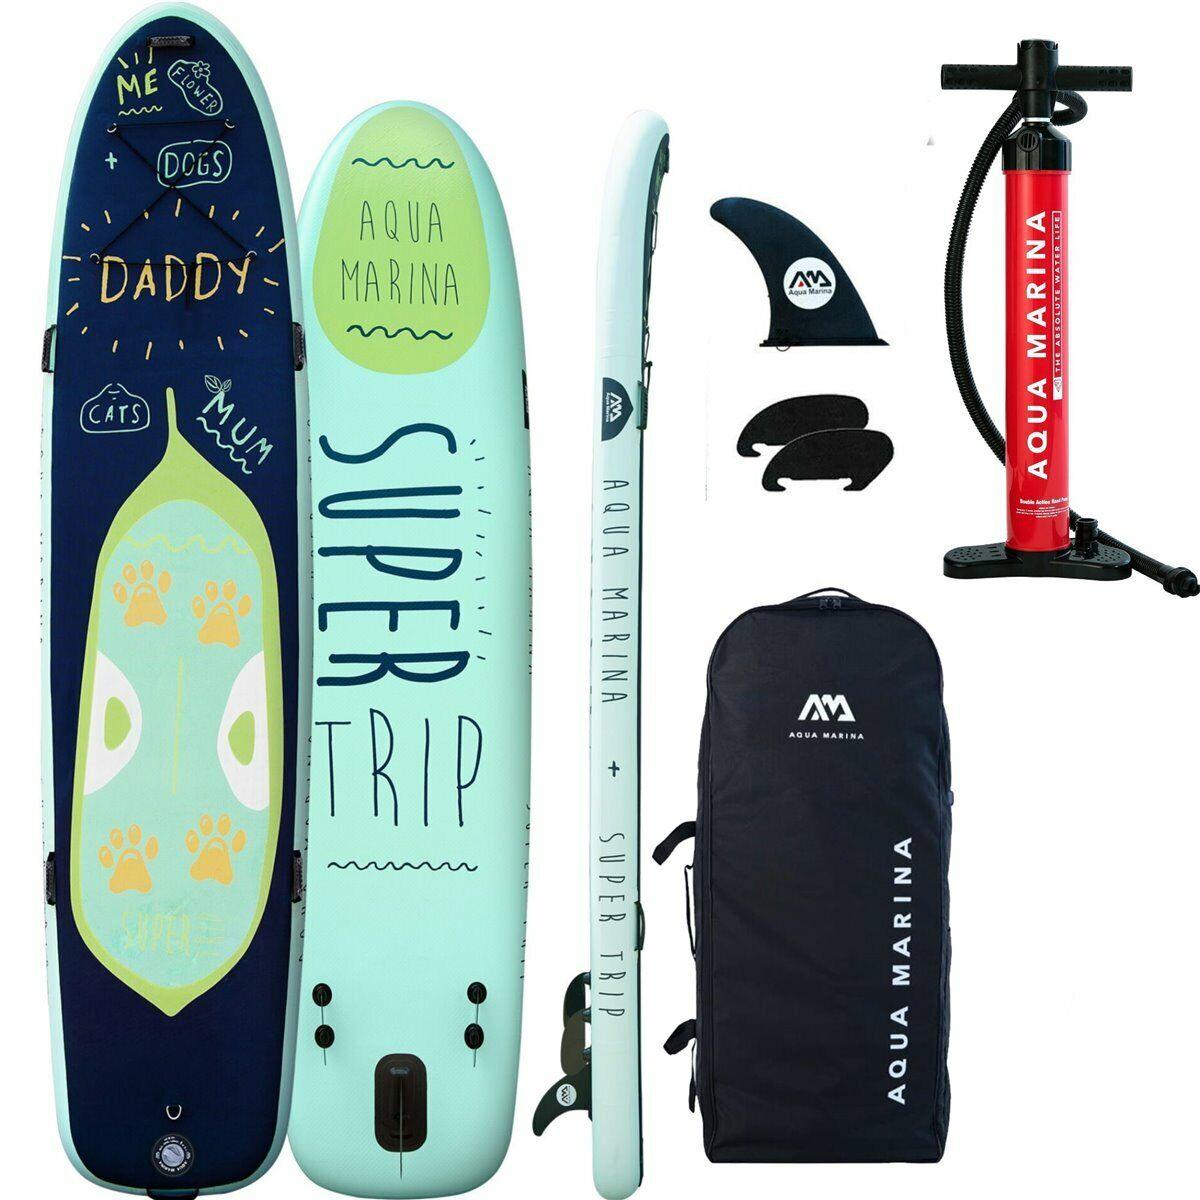 Aqua Marina Sup Eccellente Viaggio Ste Up Paddle Tavola Mega Surf modellolo 2019